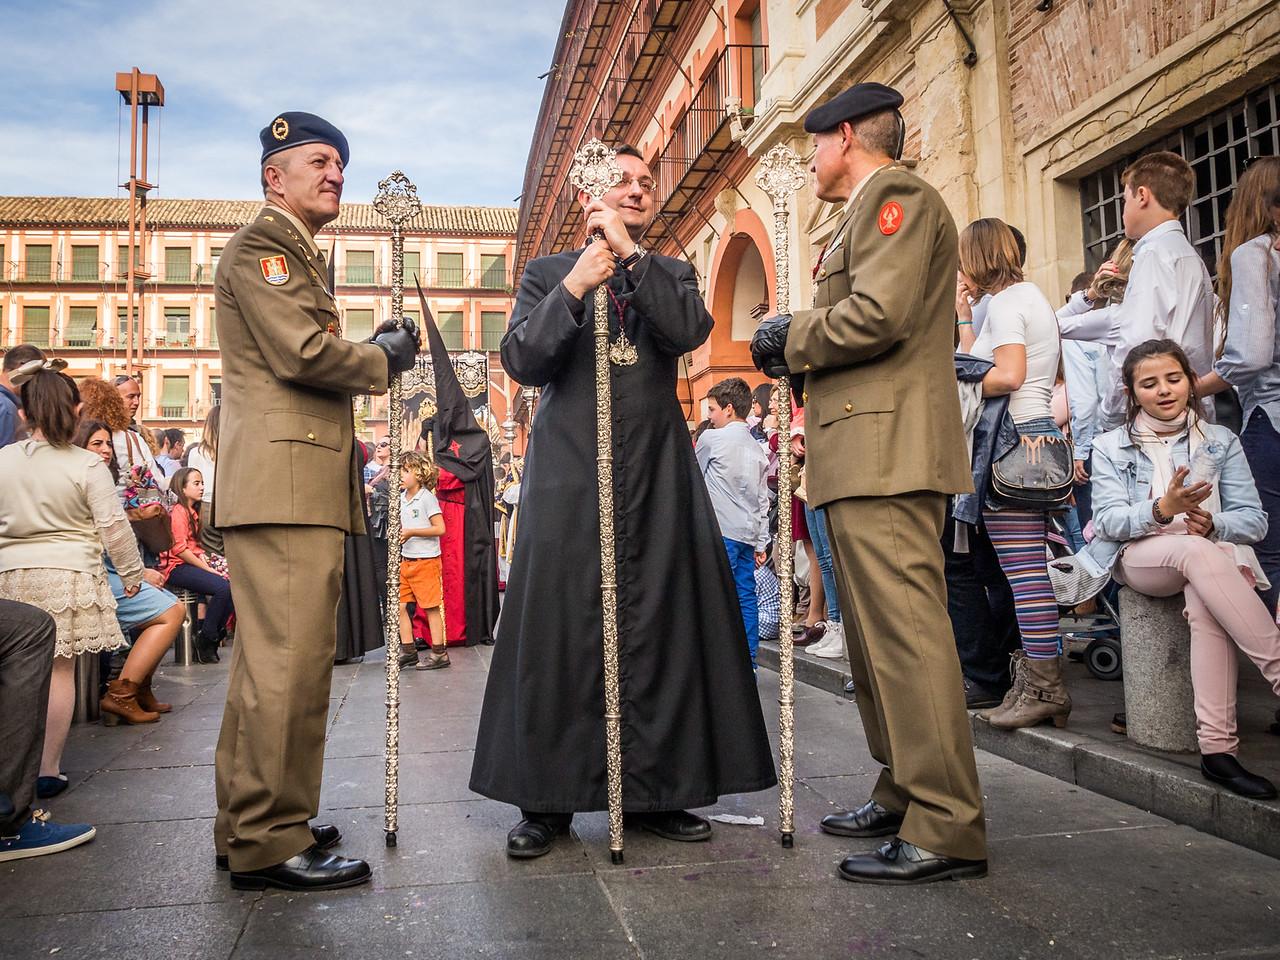 Officers and Priest in the Semana Santa Procession, Córdoba, Spain